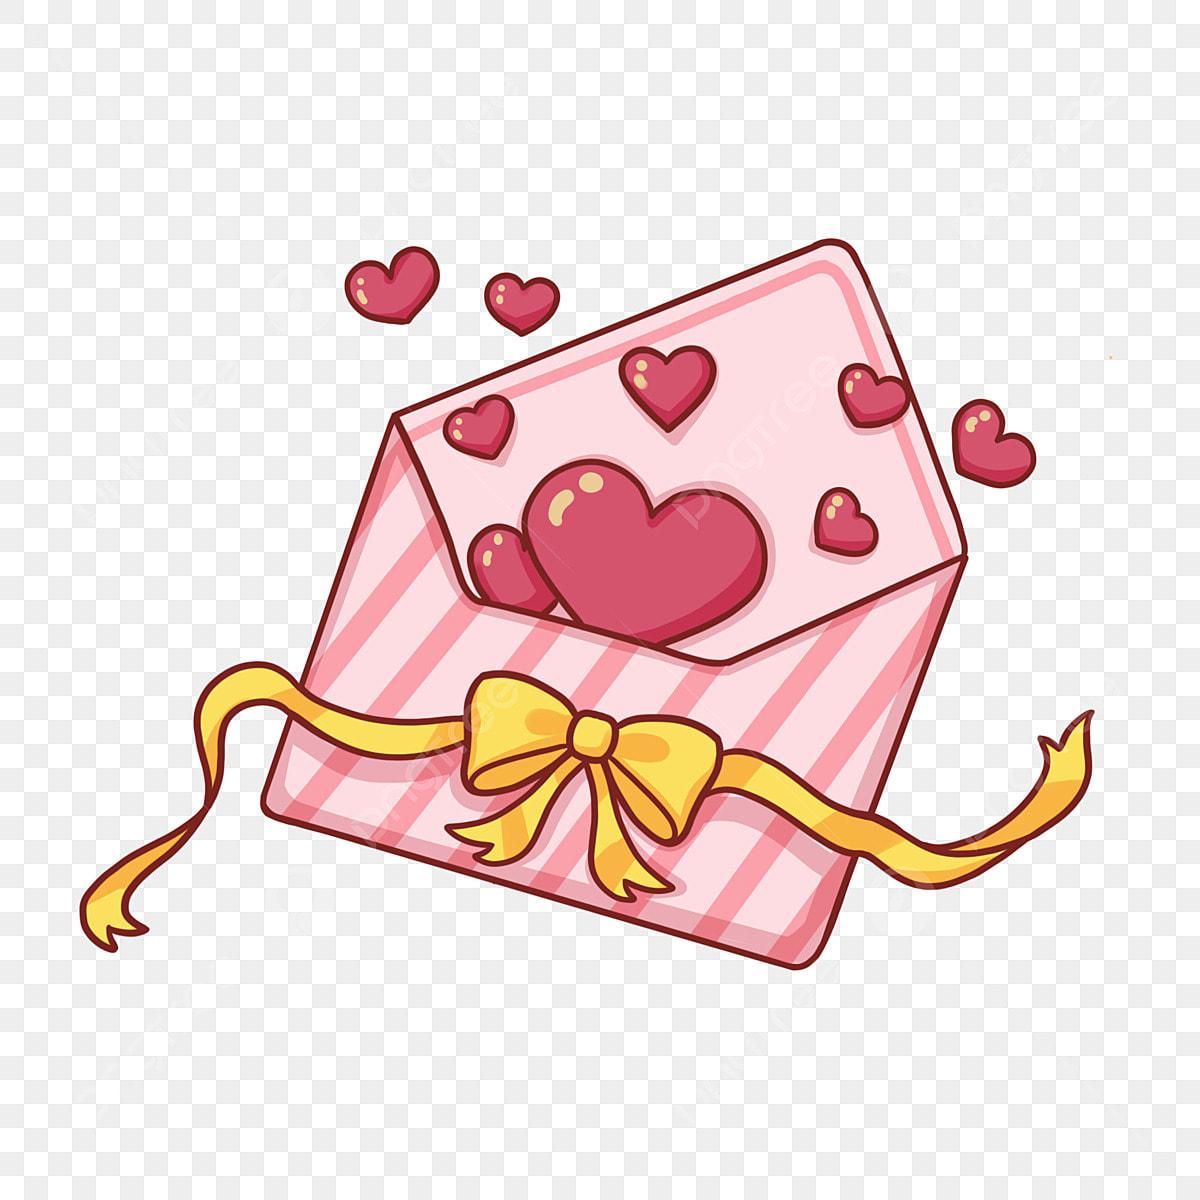 Ilustrasi Kecil Hari Valentine Sampul Surat Cinta Tunduk